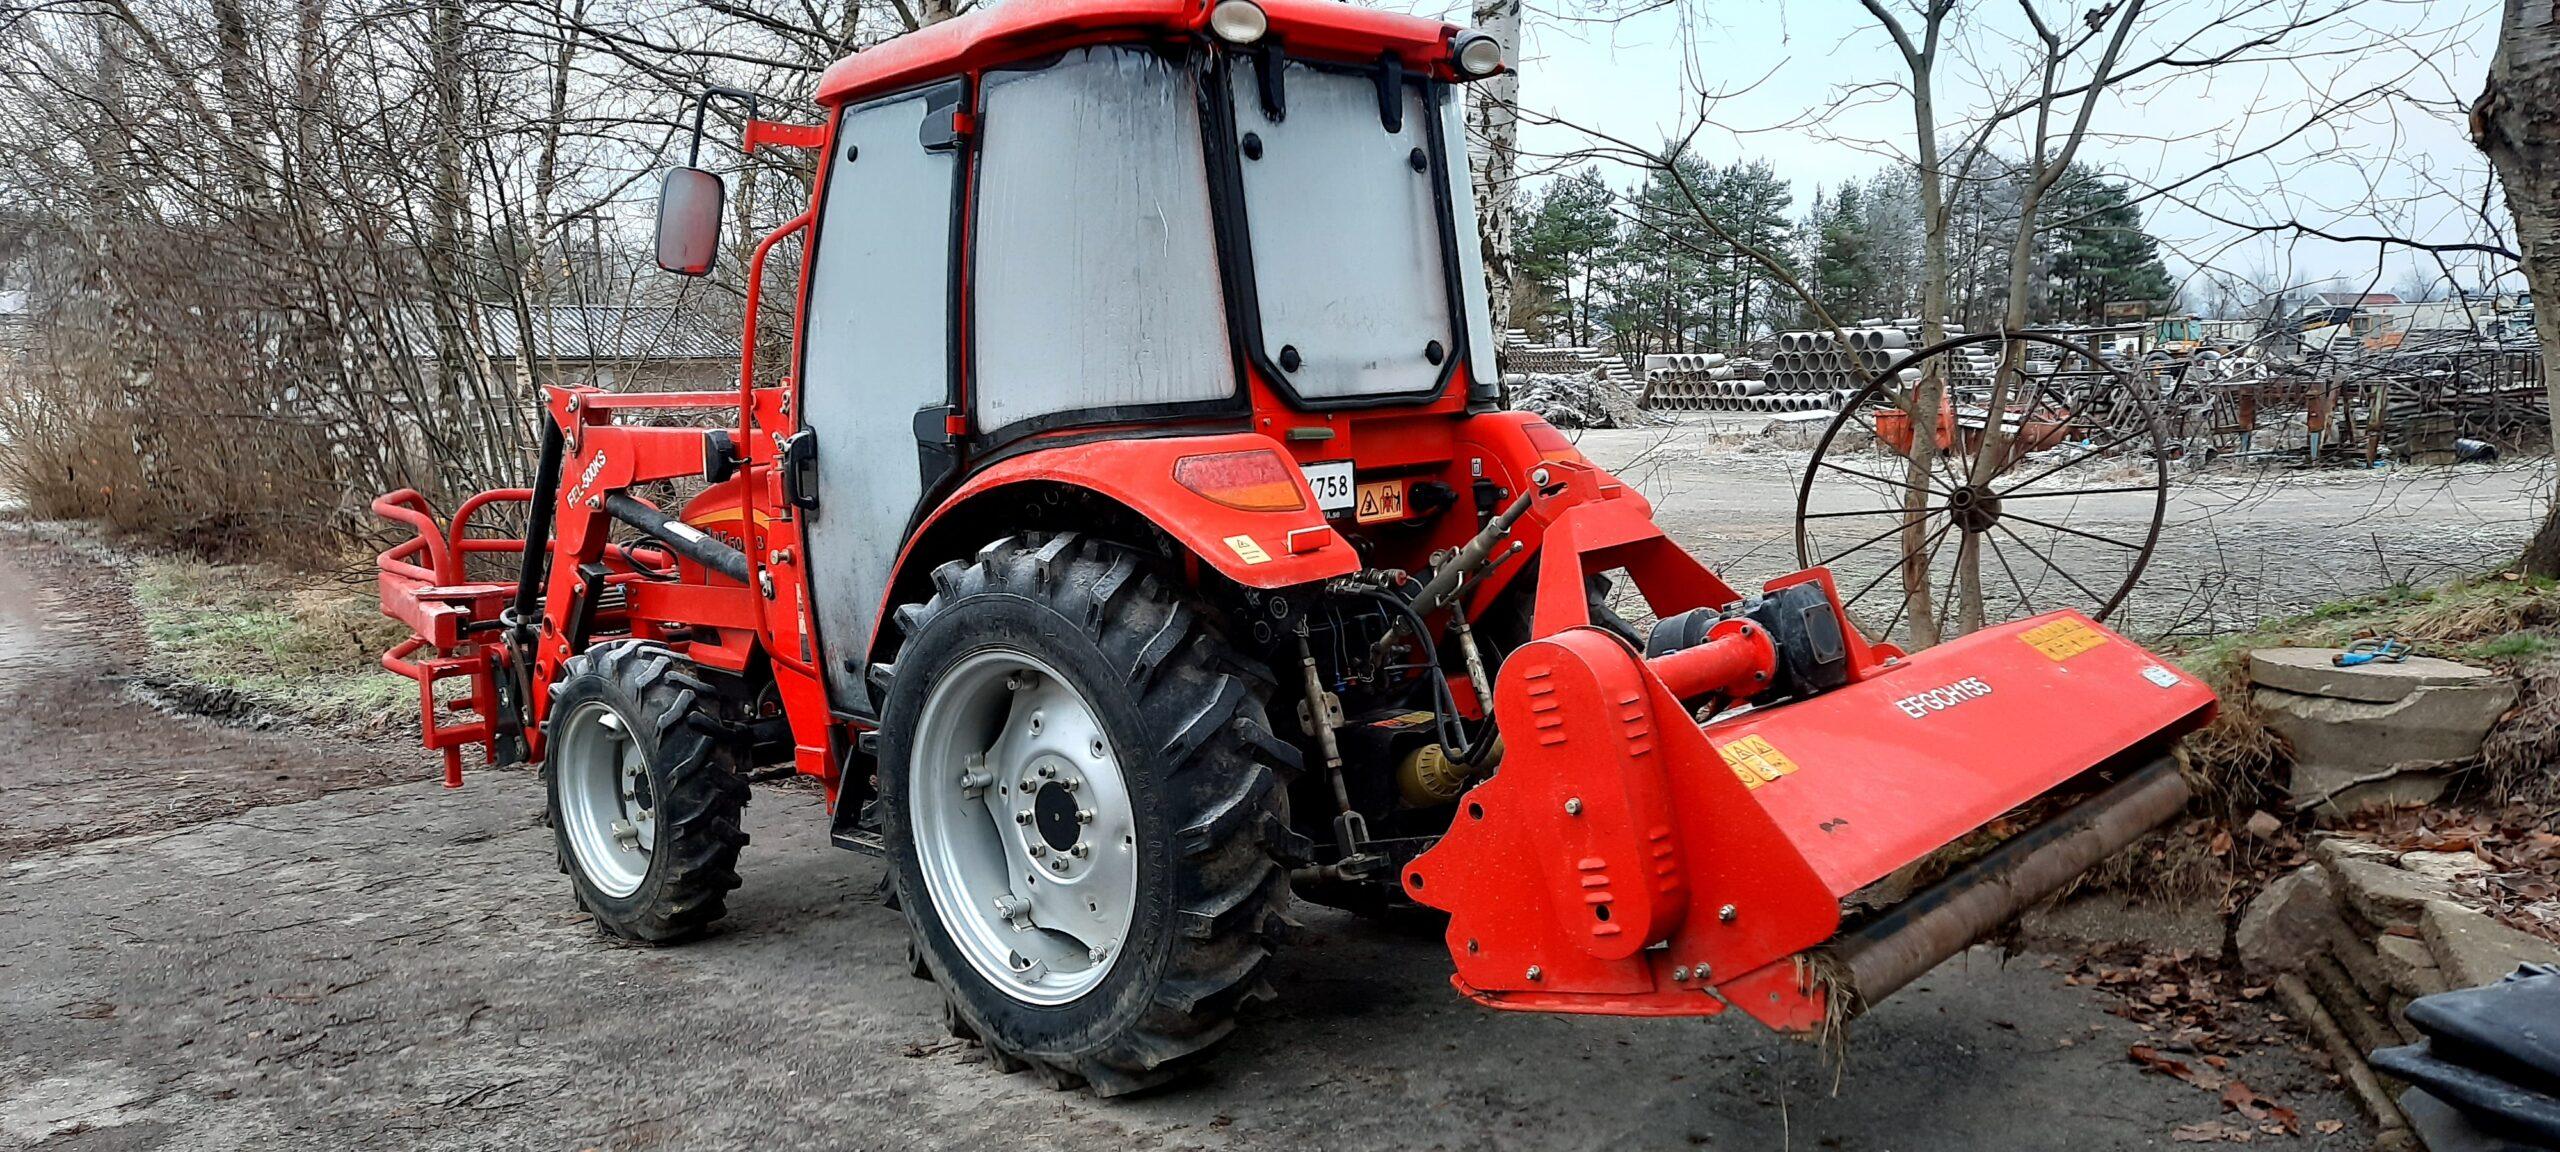 Traktor bak